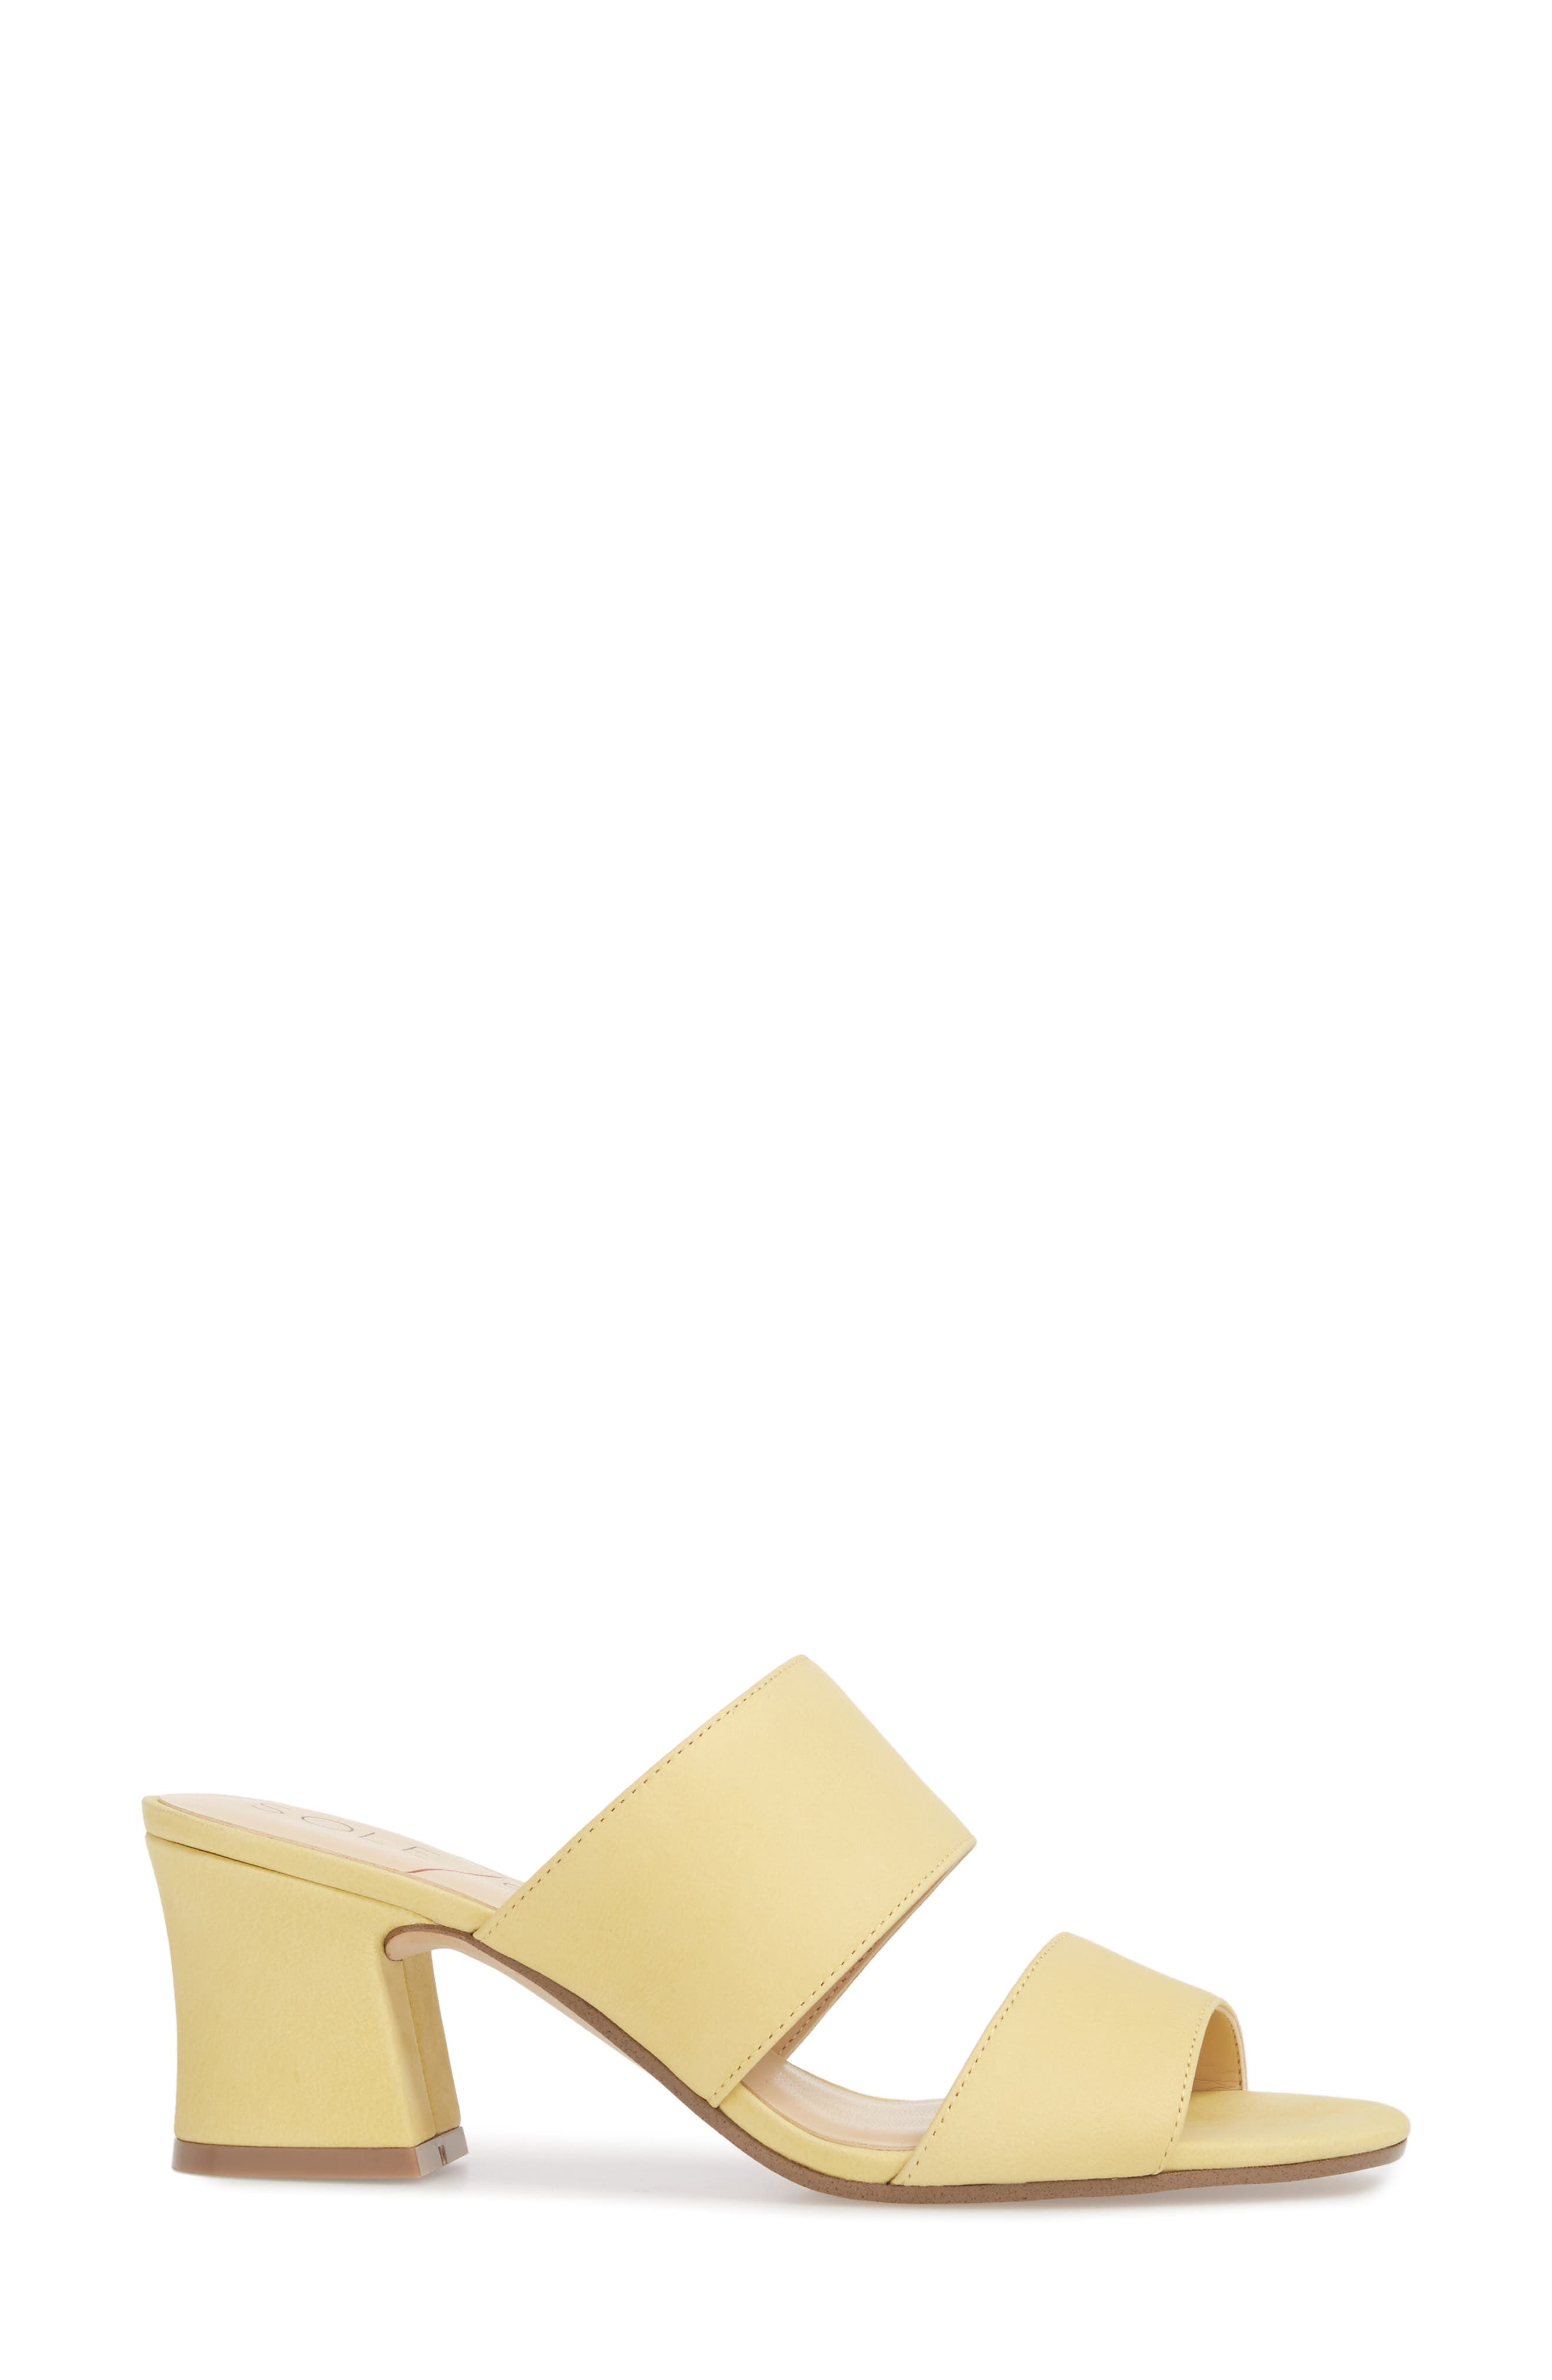 Heline Slide Sandal,                             Alternate thumbnail 3, color,                             Pale Yellow